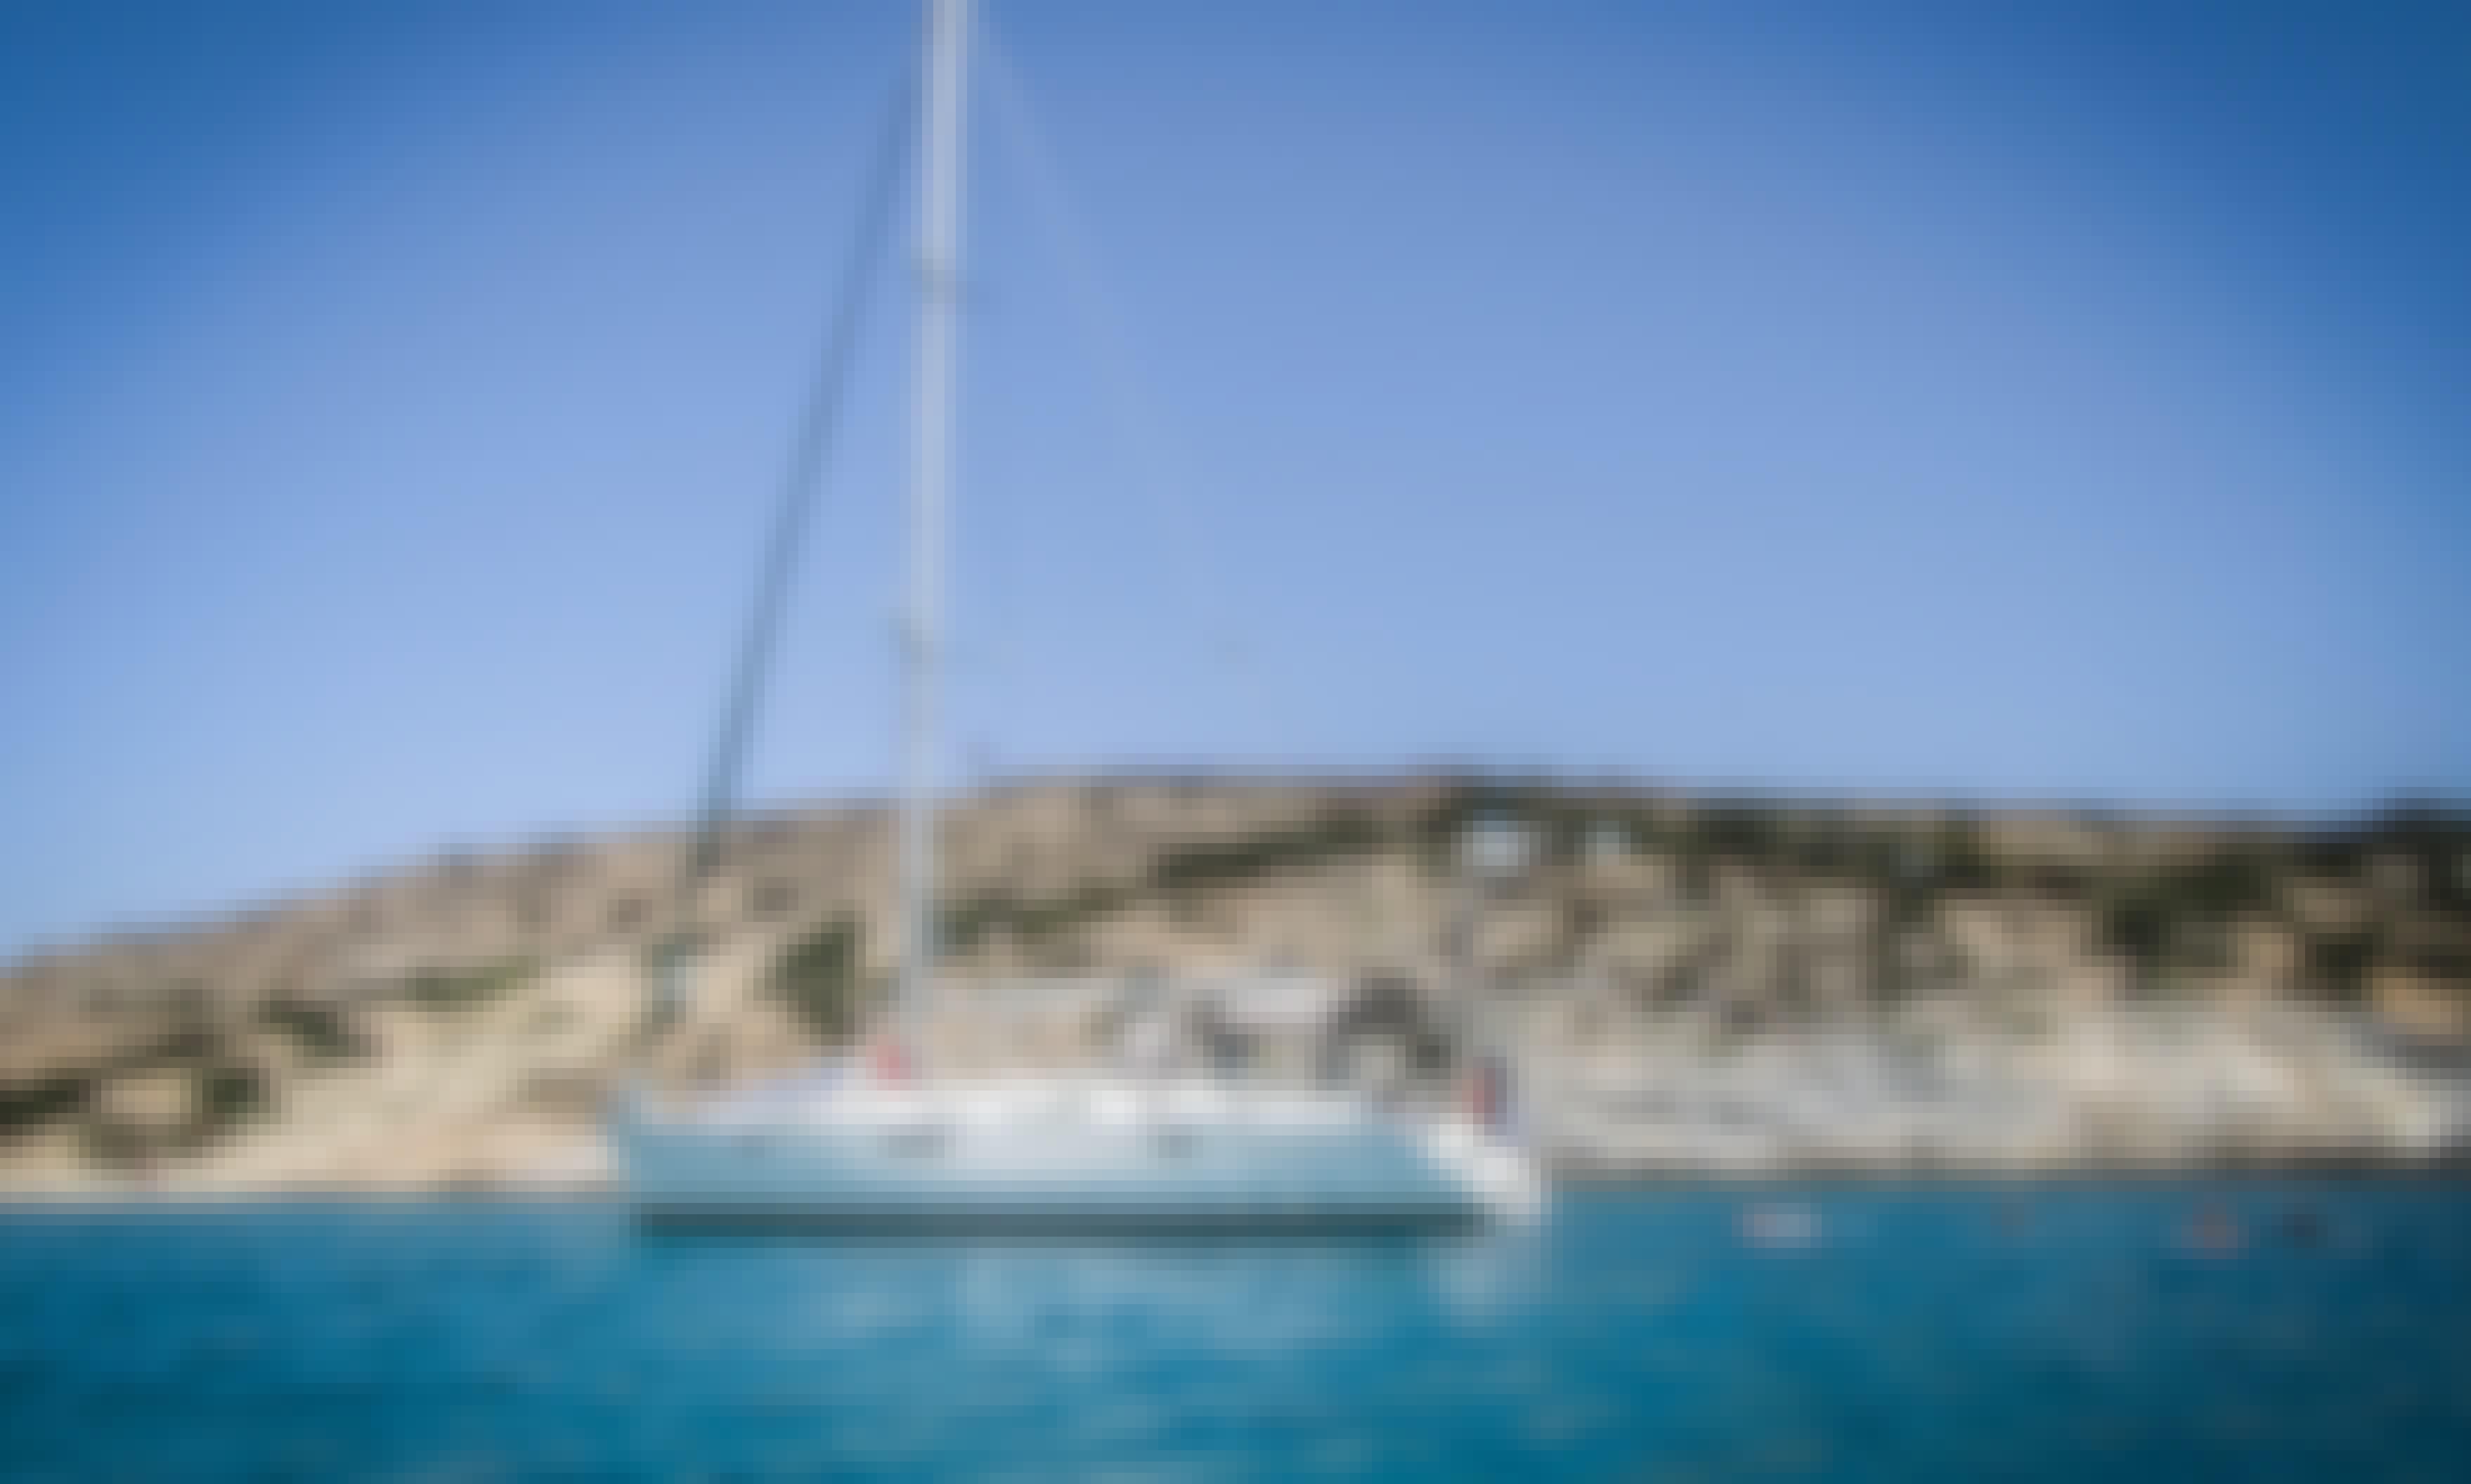 Captain Charter On 44' Beneteau Oceanis Cruising Monohull In Naxos, Greece